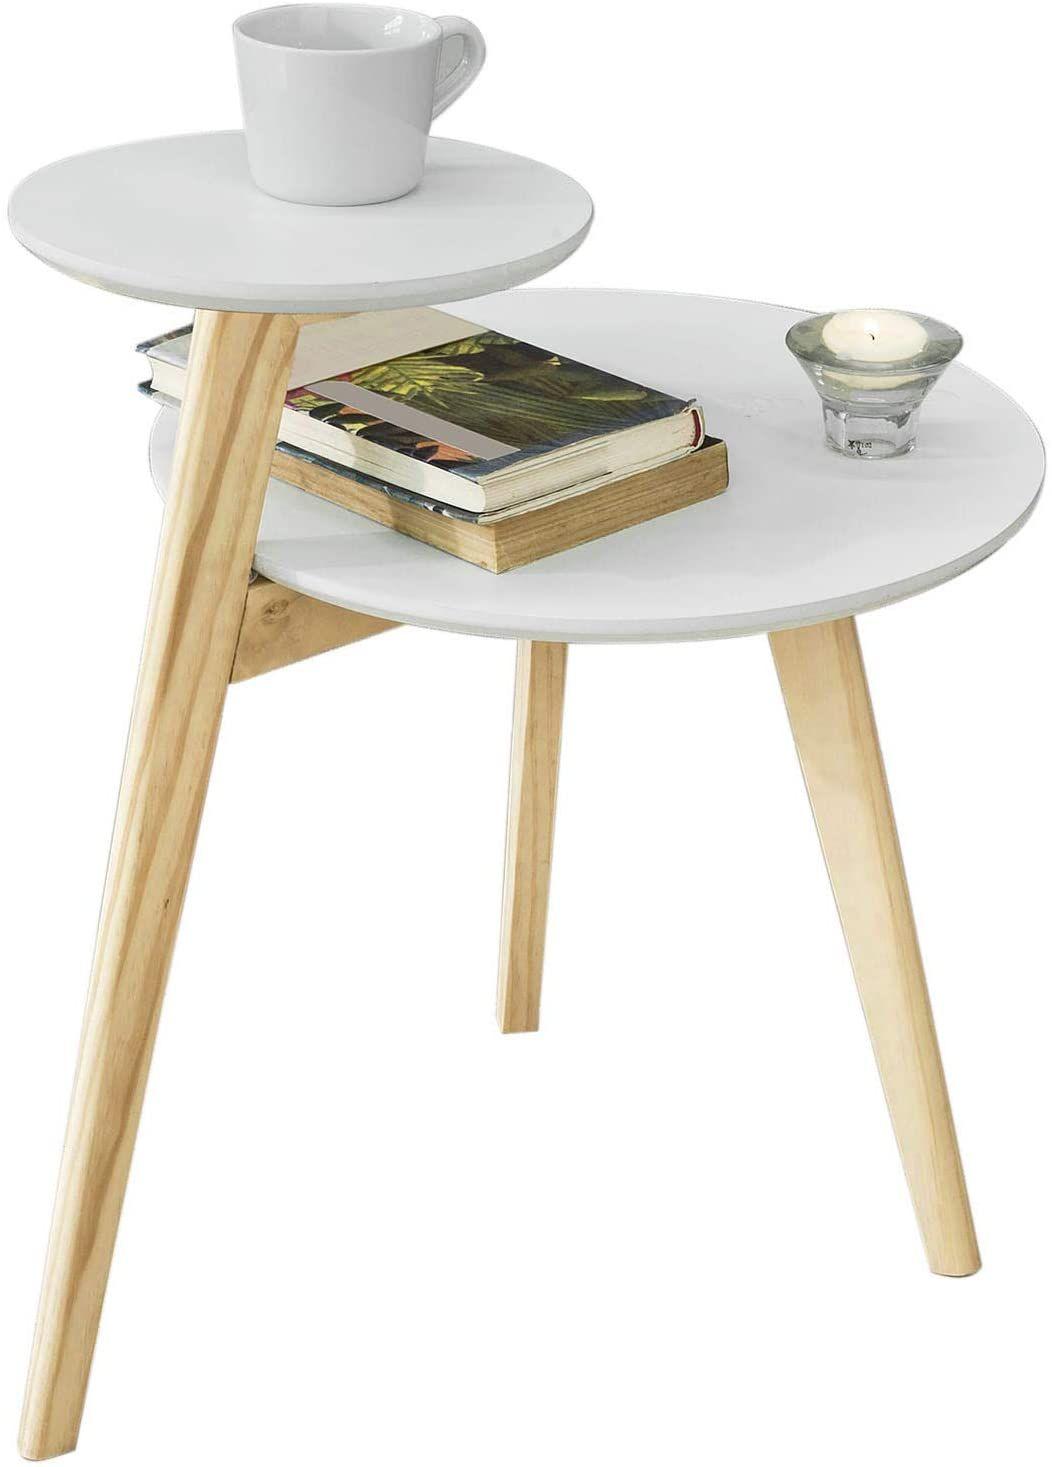 Sobuy Fbt53 Wn Table Basse Design Table D Appoint Ronde Table Cafe 2 Plateaux 3 Pieds En 2020 Table Basse Design Table Cafe Table Basse